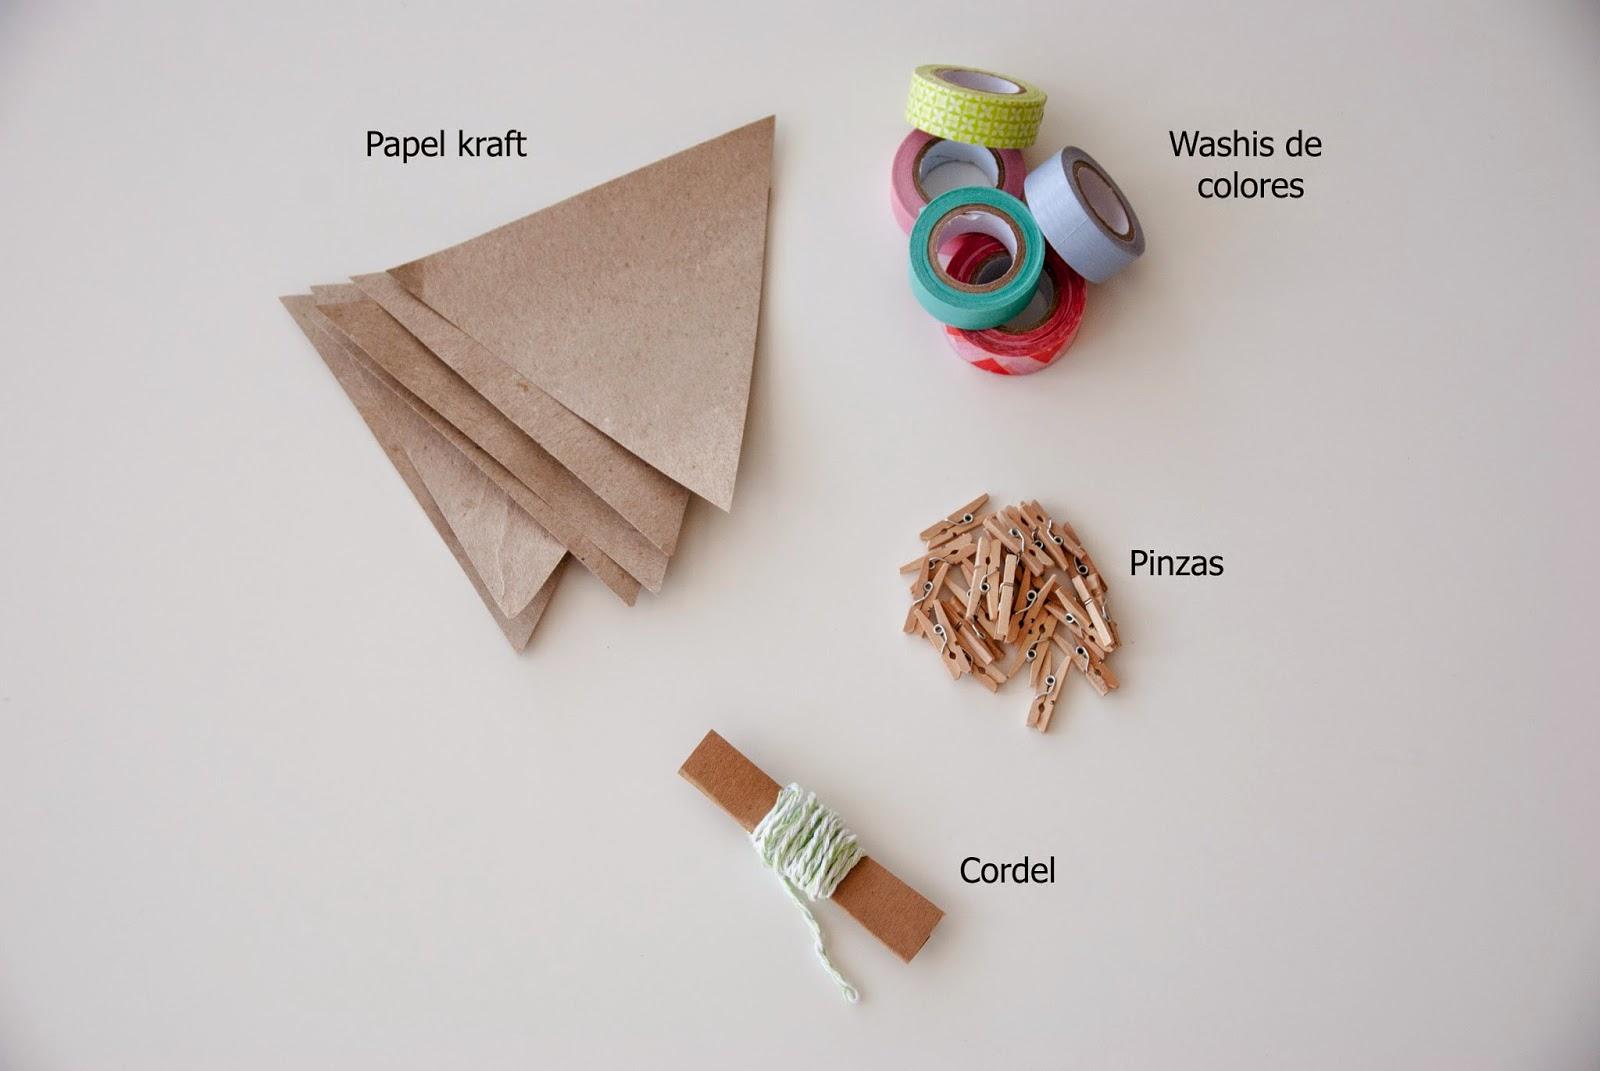 imagen materiales banderines washi tape